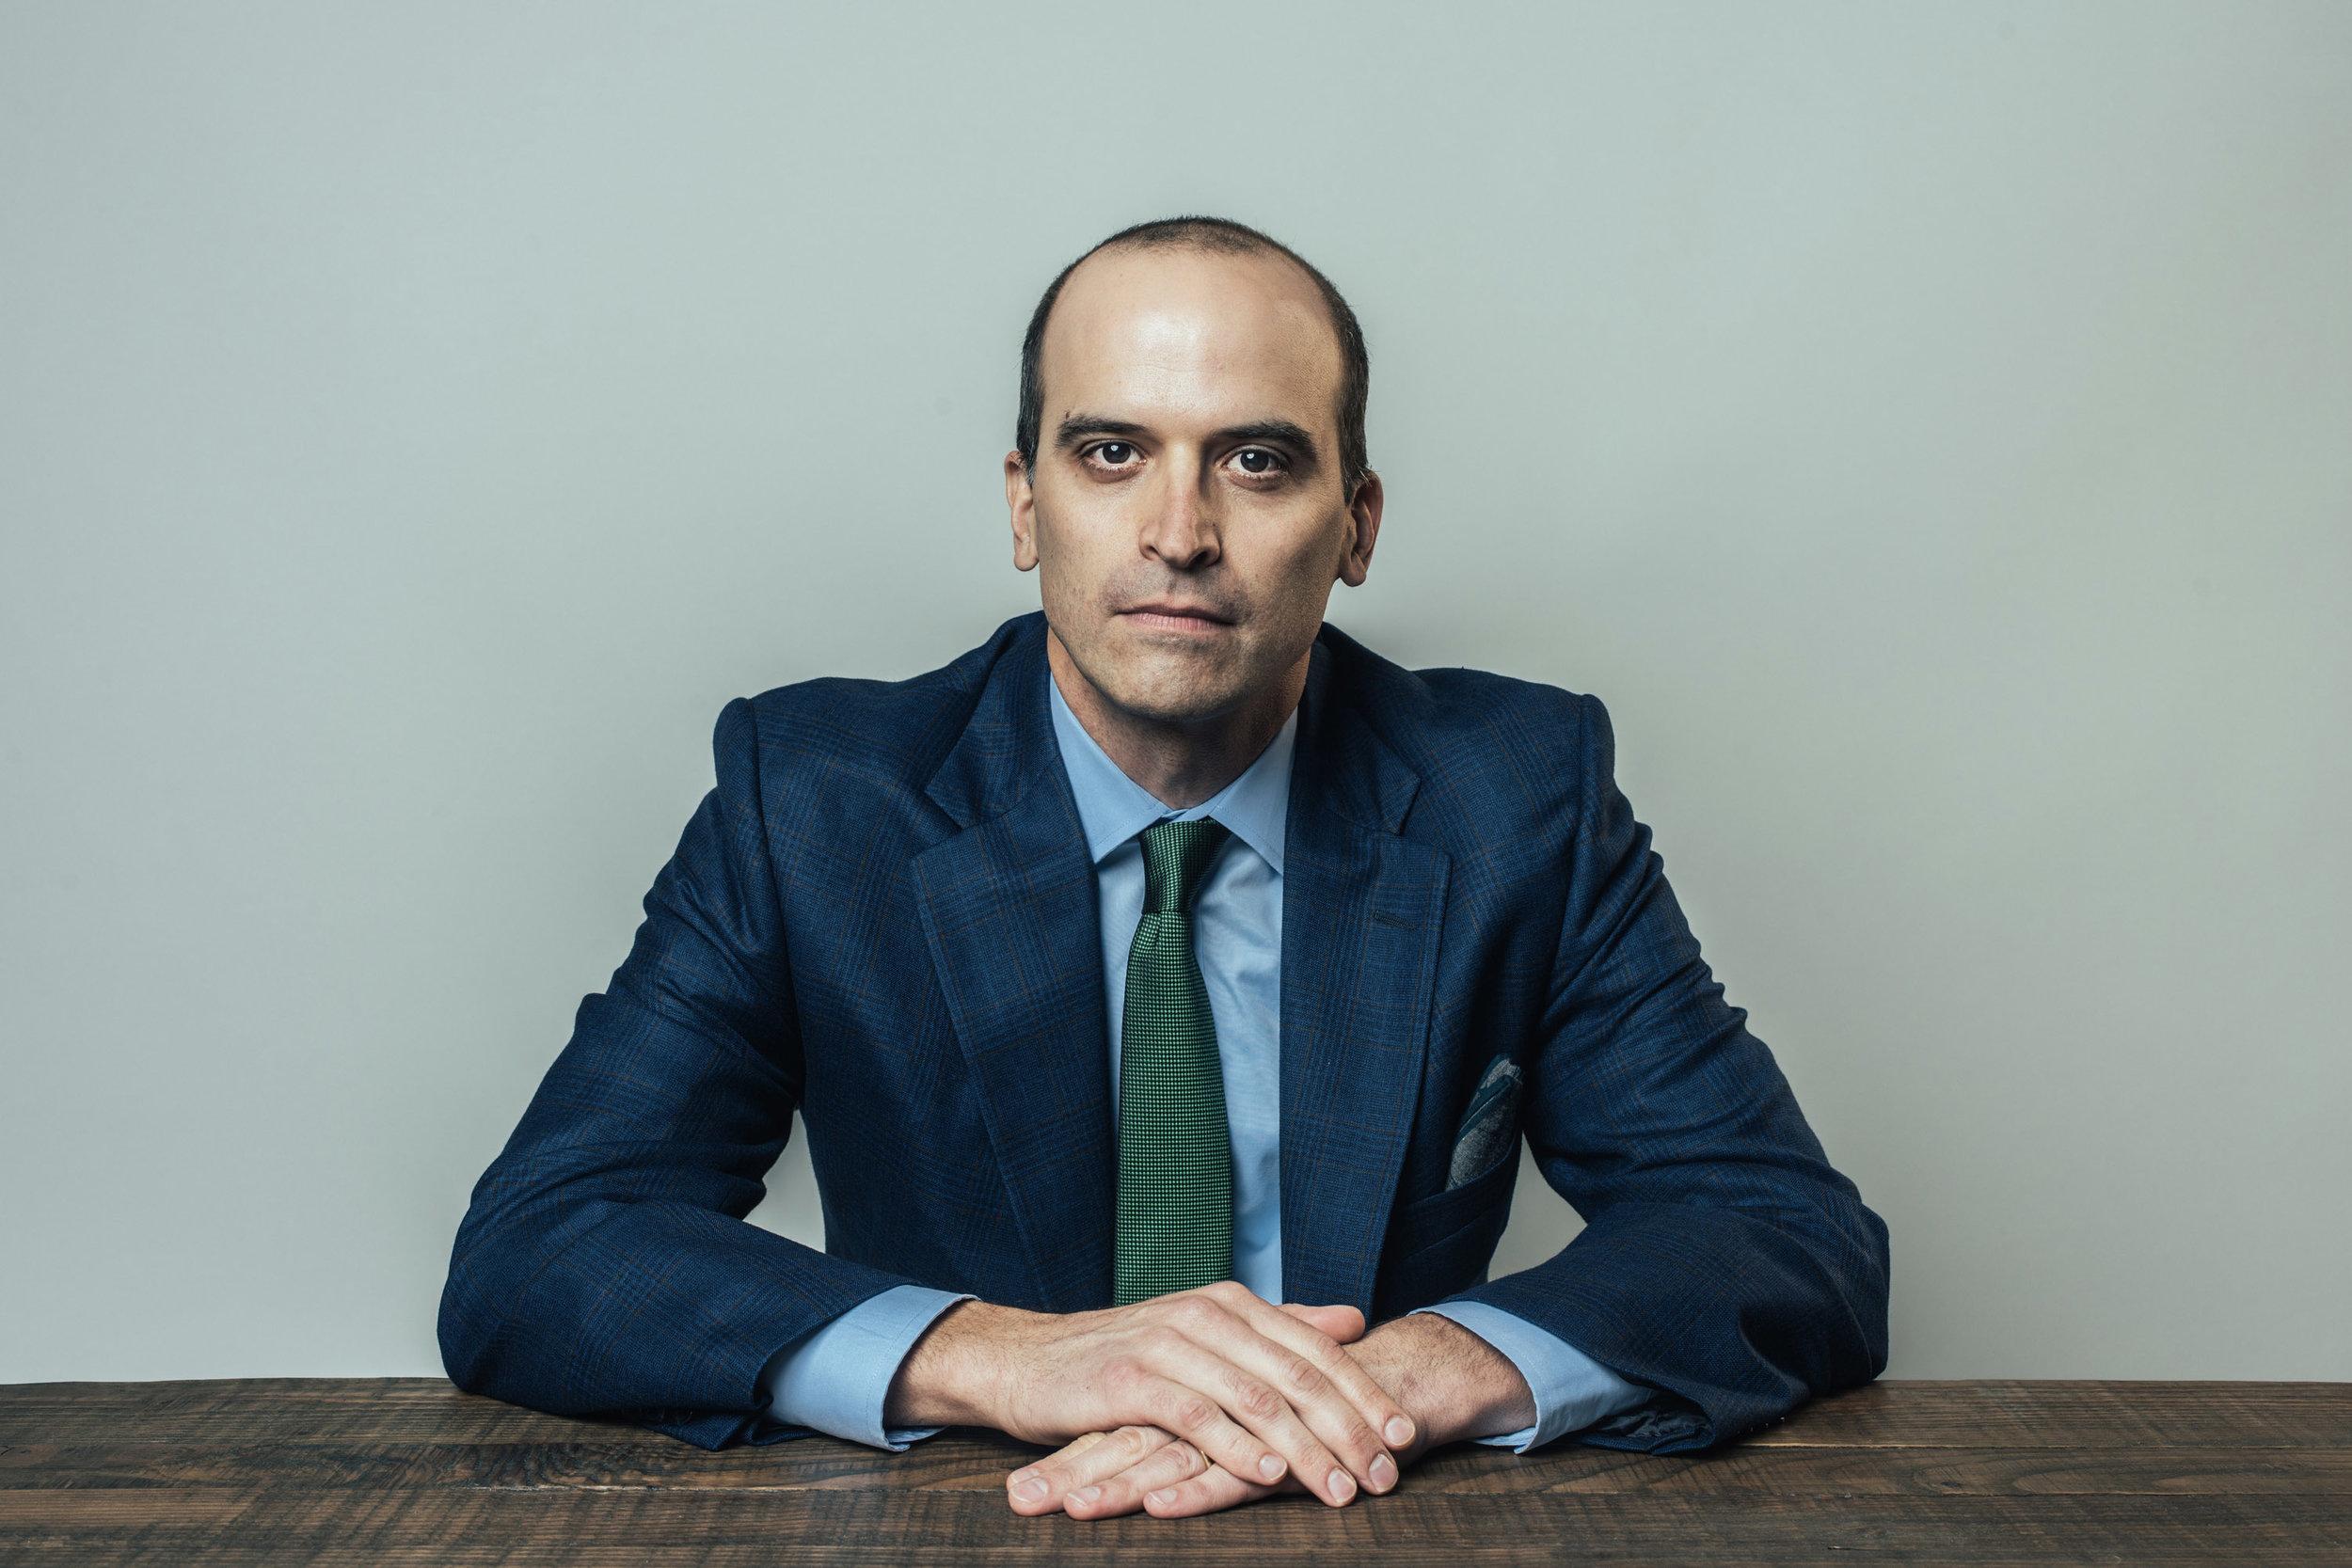 New York Times journalist David Leonhardt